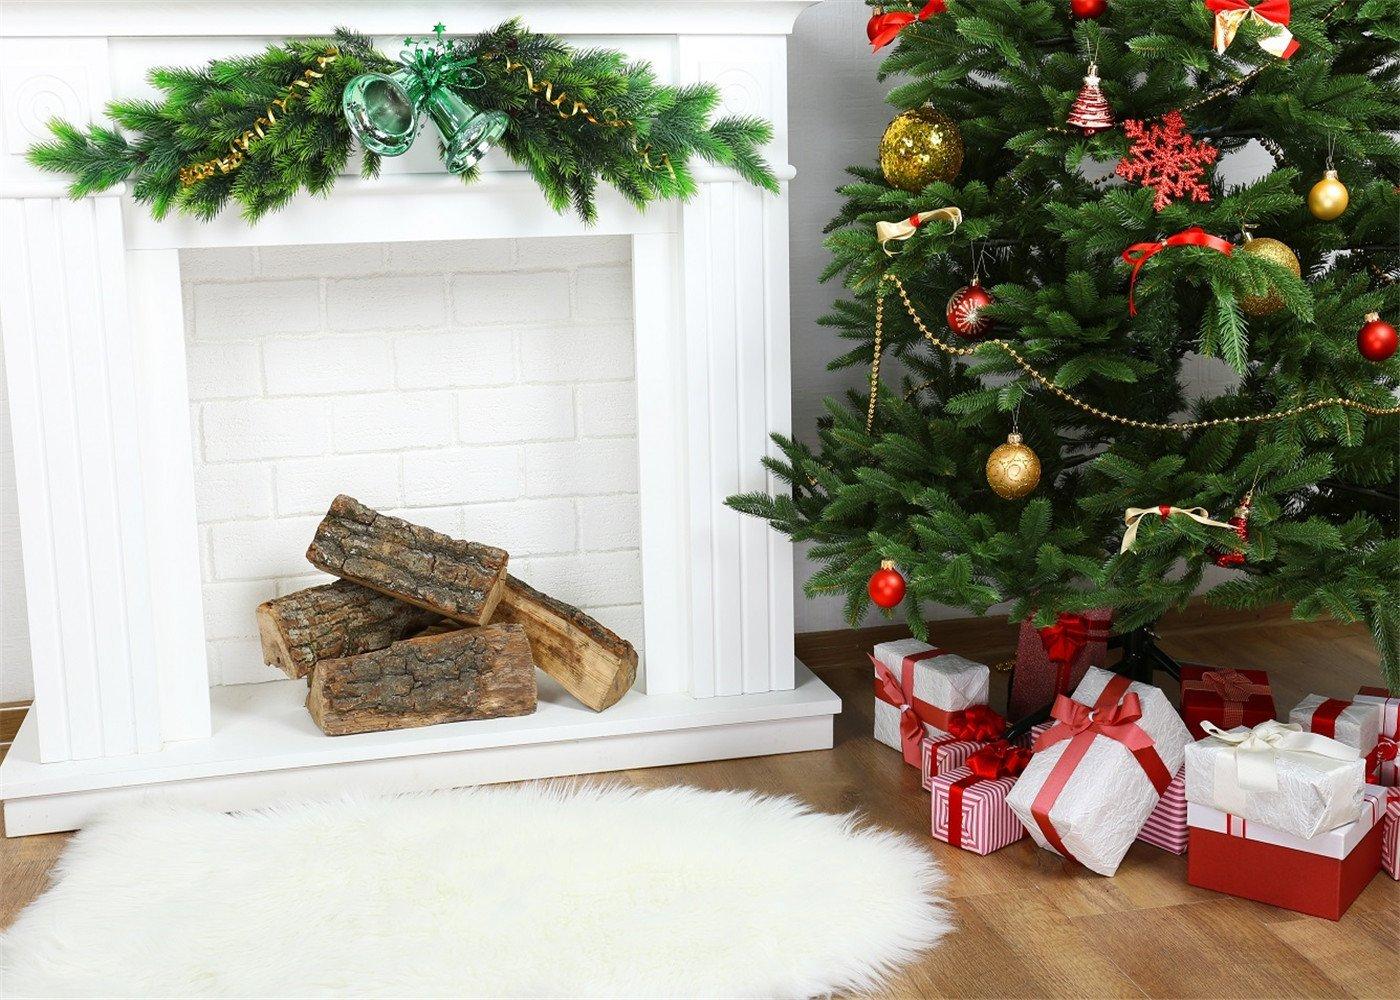 Arbre Bois Blanc Decoration buy kate 7x5ft christmas backdrop fireplace christmas tree